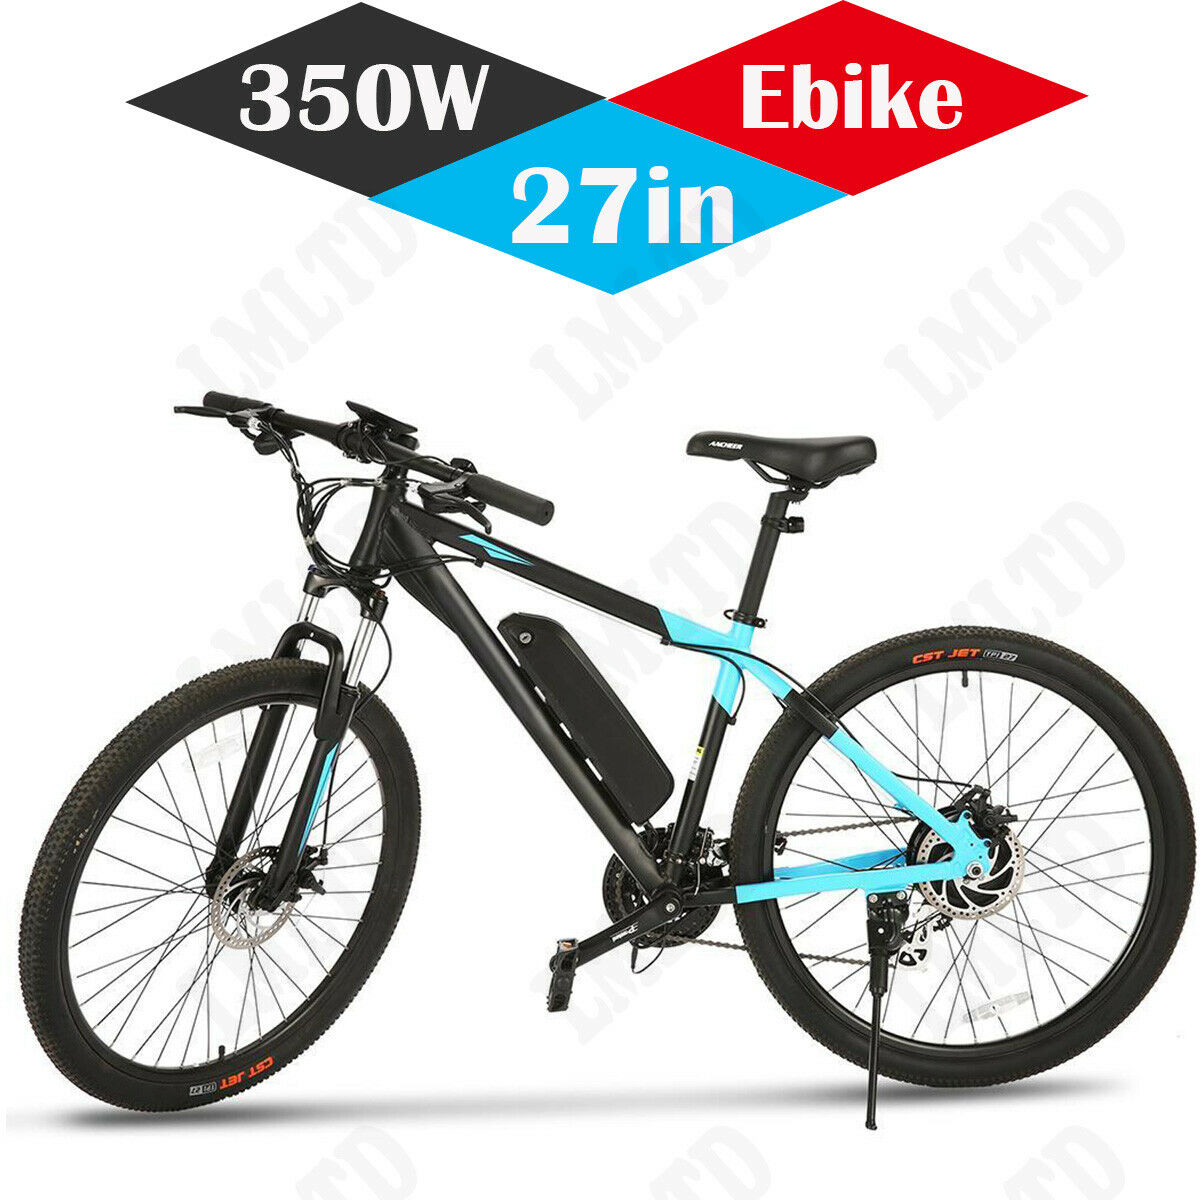 350W 26'' Electric Bike Ebike Mountain Bicycle Folding Cycli